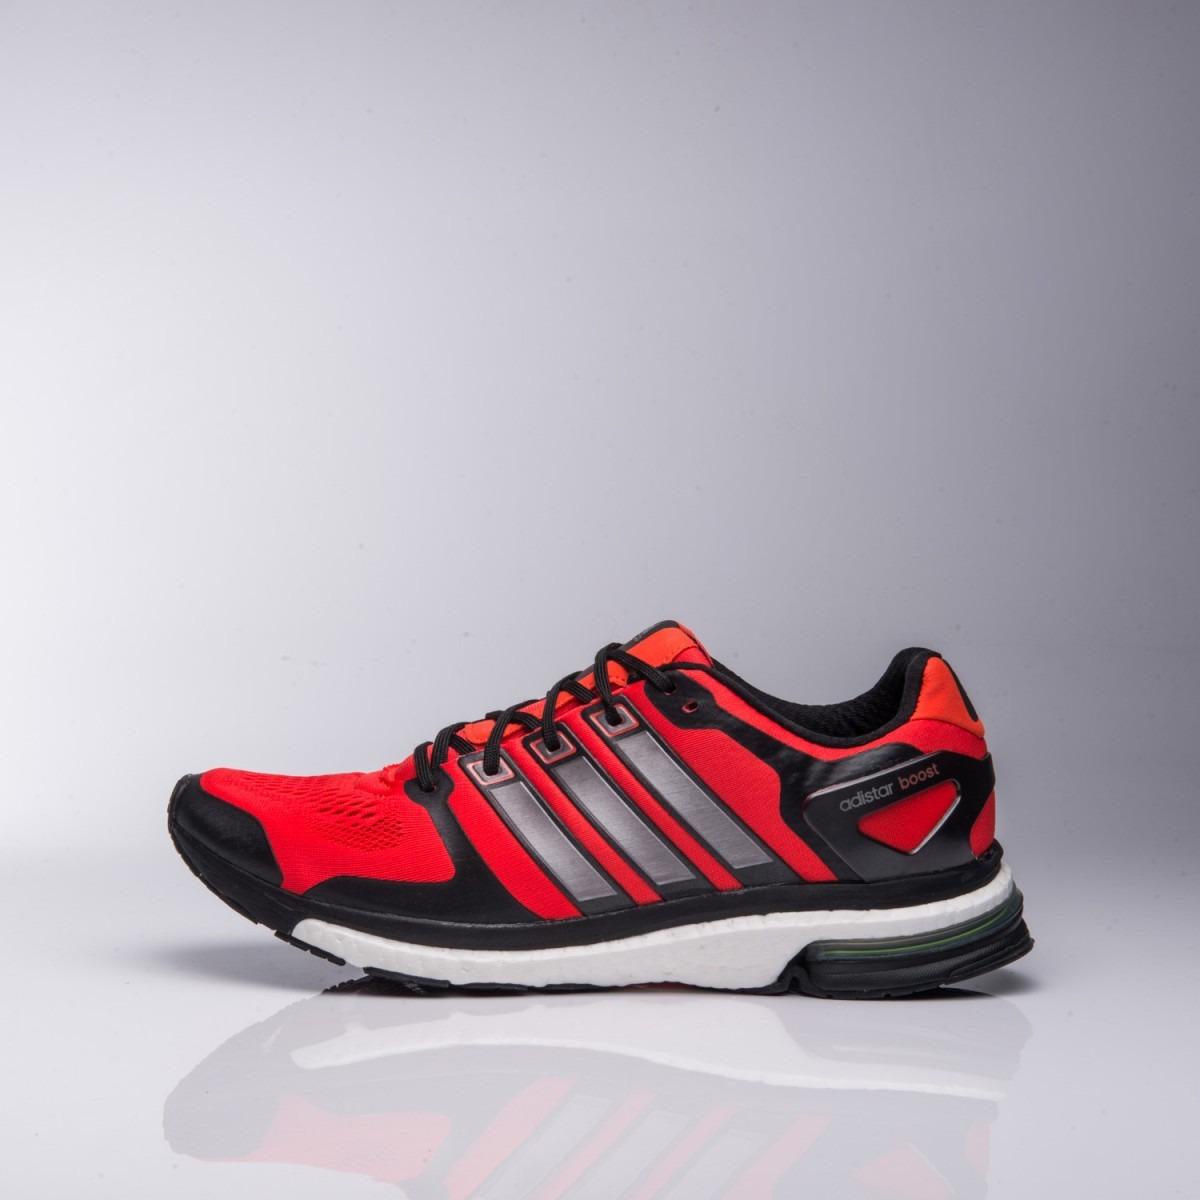 zapatillas adidas adistar boost m esm